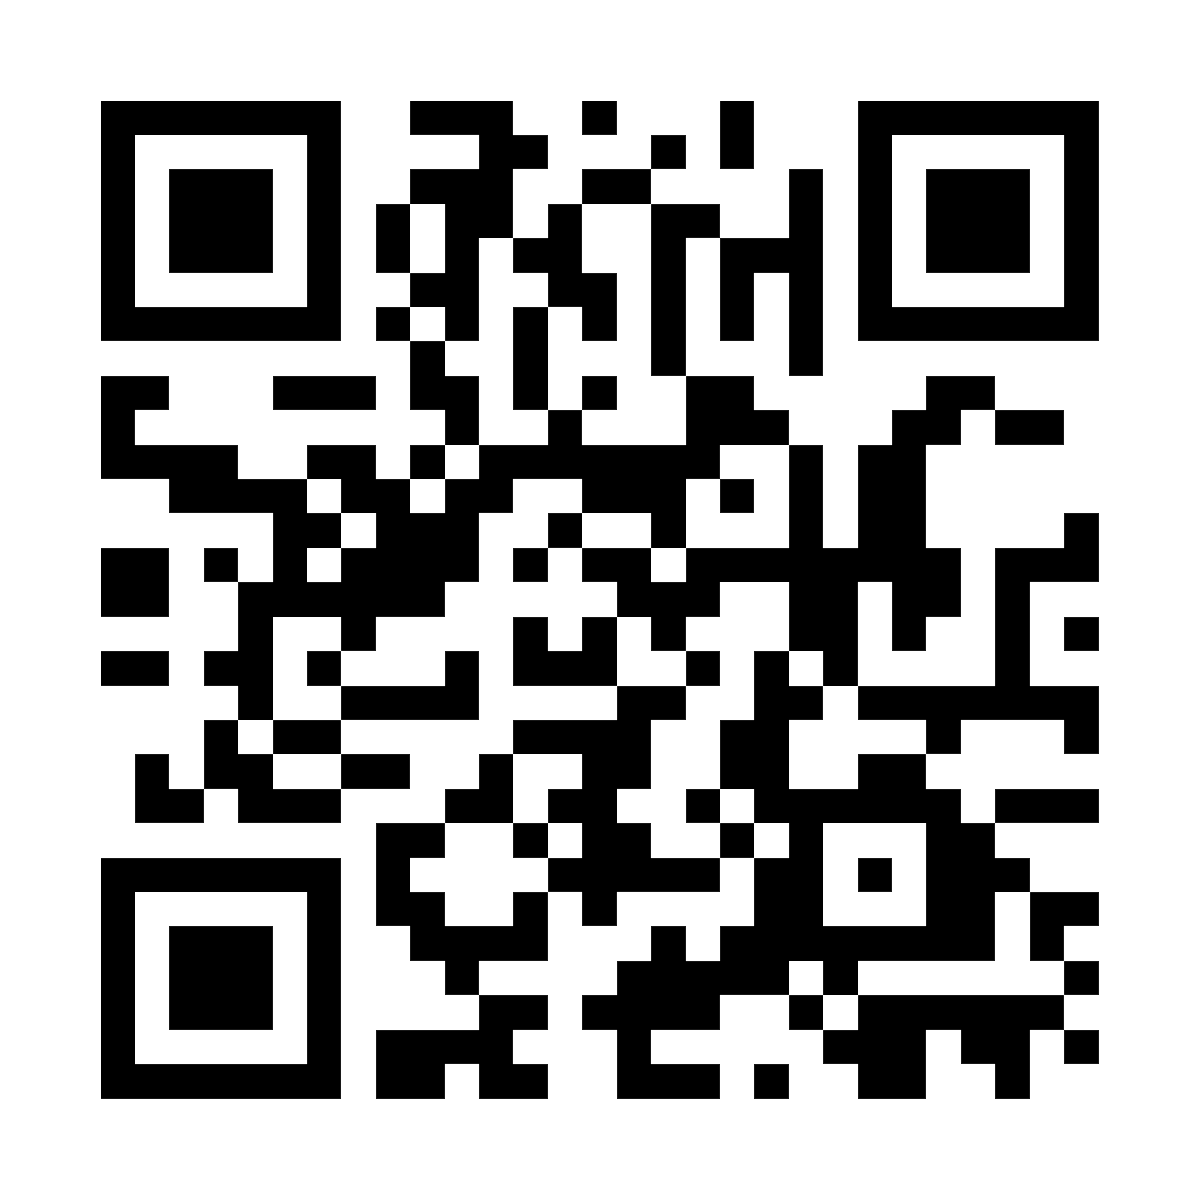 QR code PNG png